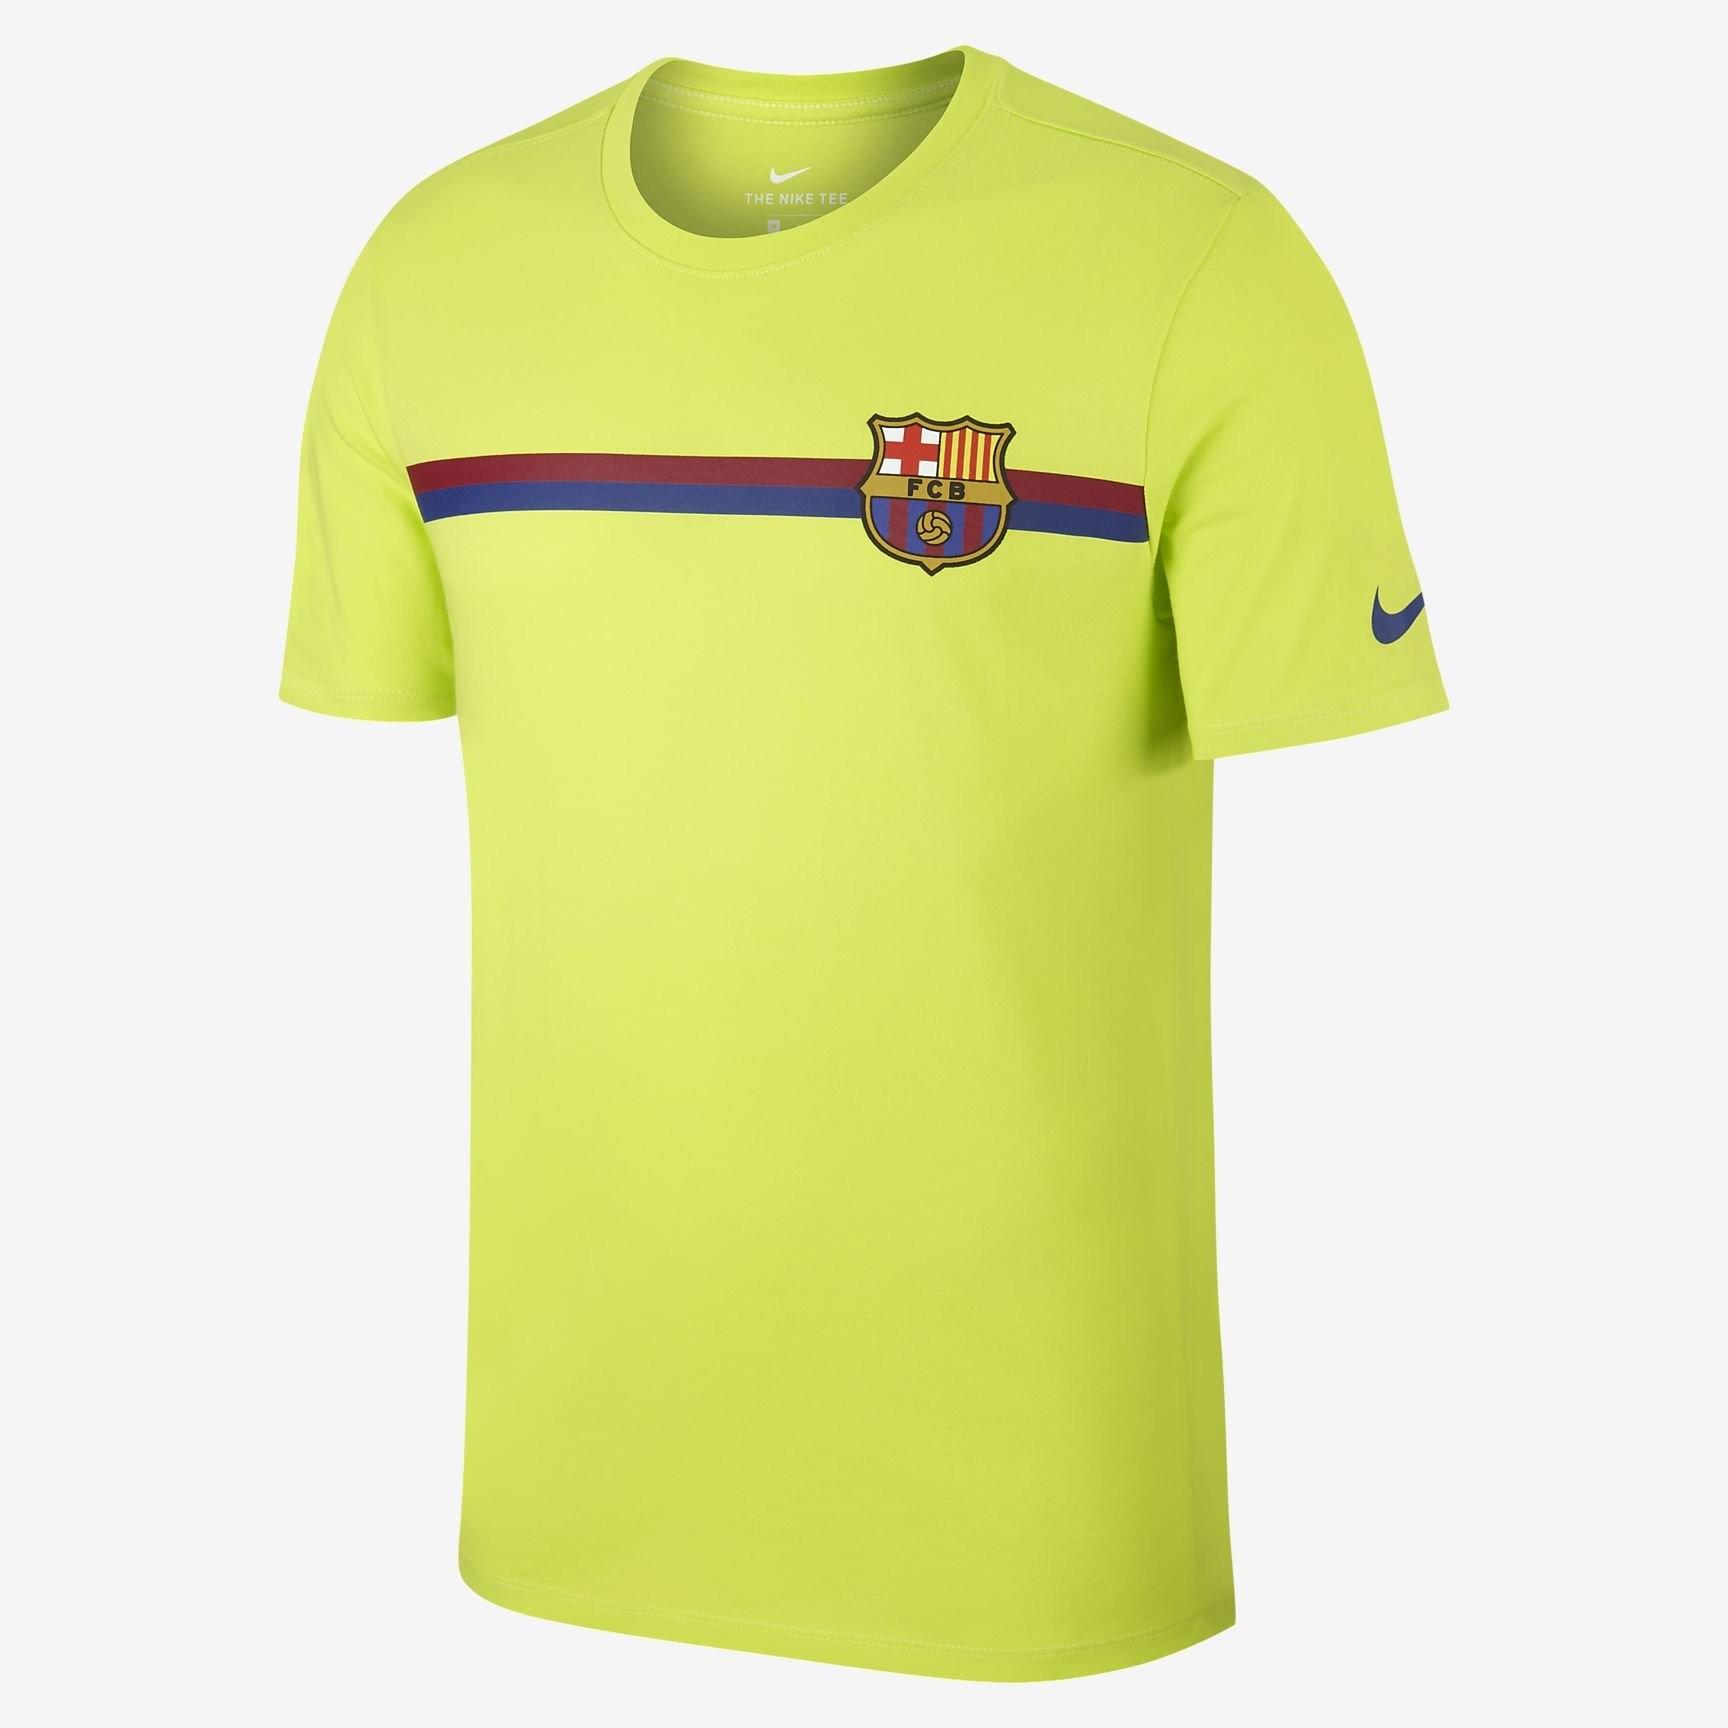 Camiseta Nike FC Barcelona Crest 924136 389 - Deportes Manzanedo 69faacc44b5